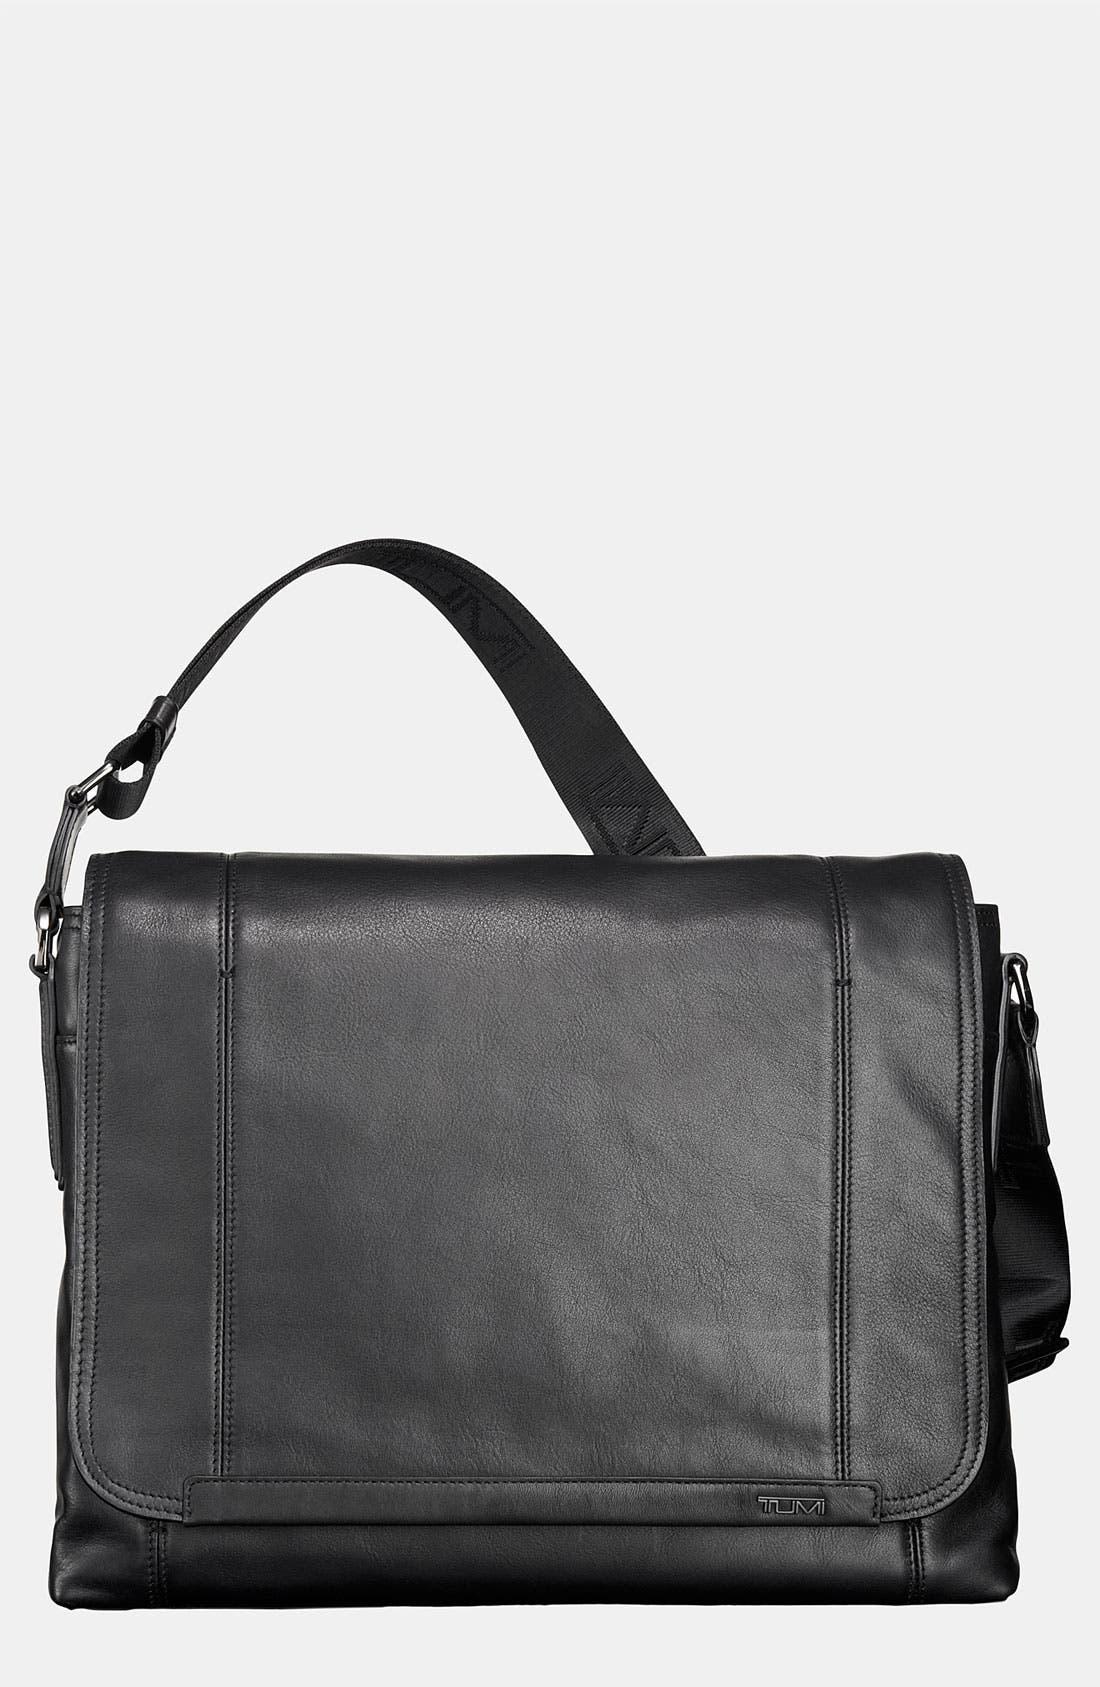 Main Image - Tumi 'Centro - Verona' Flap Messenger Bag